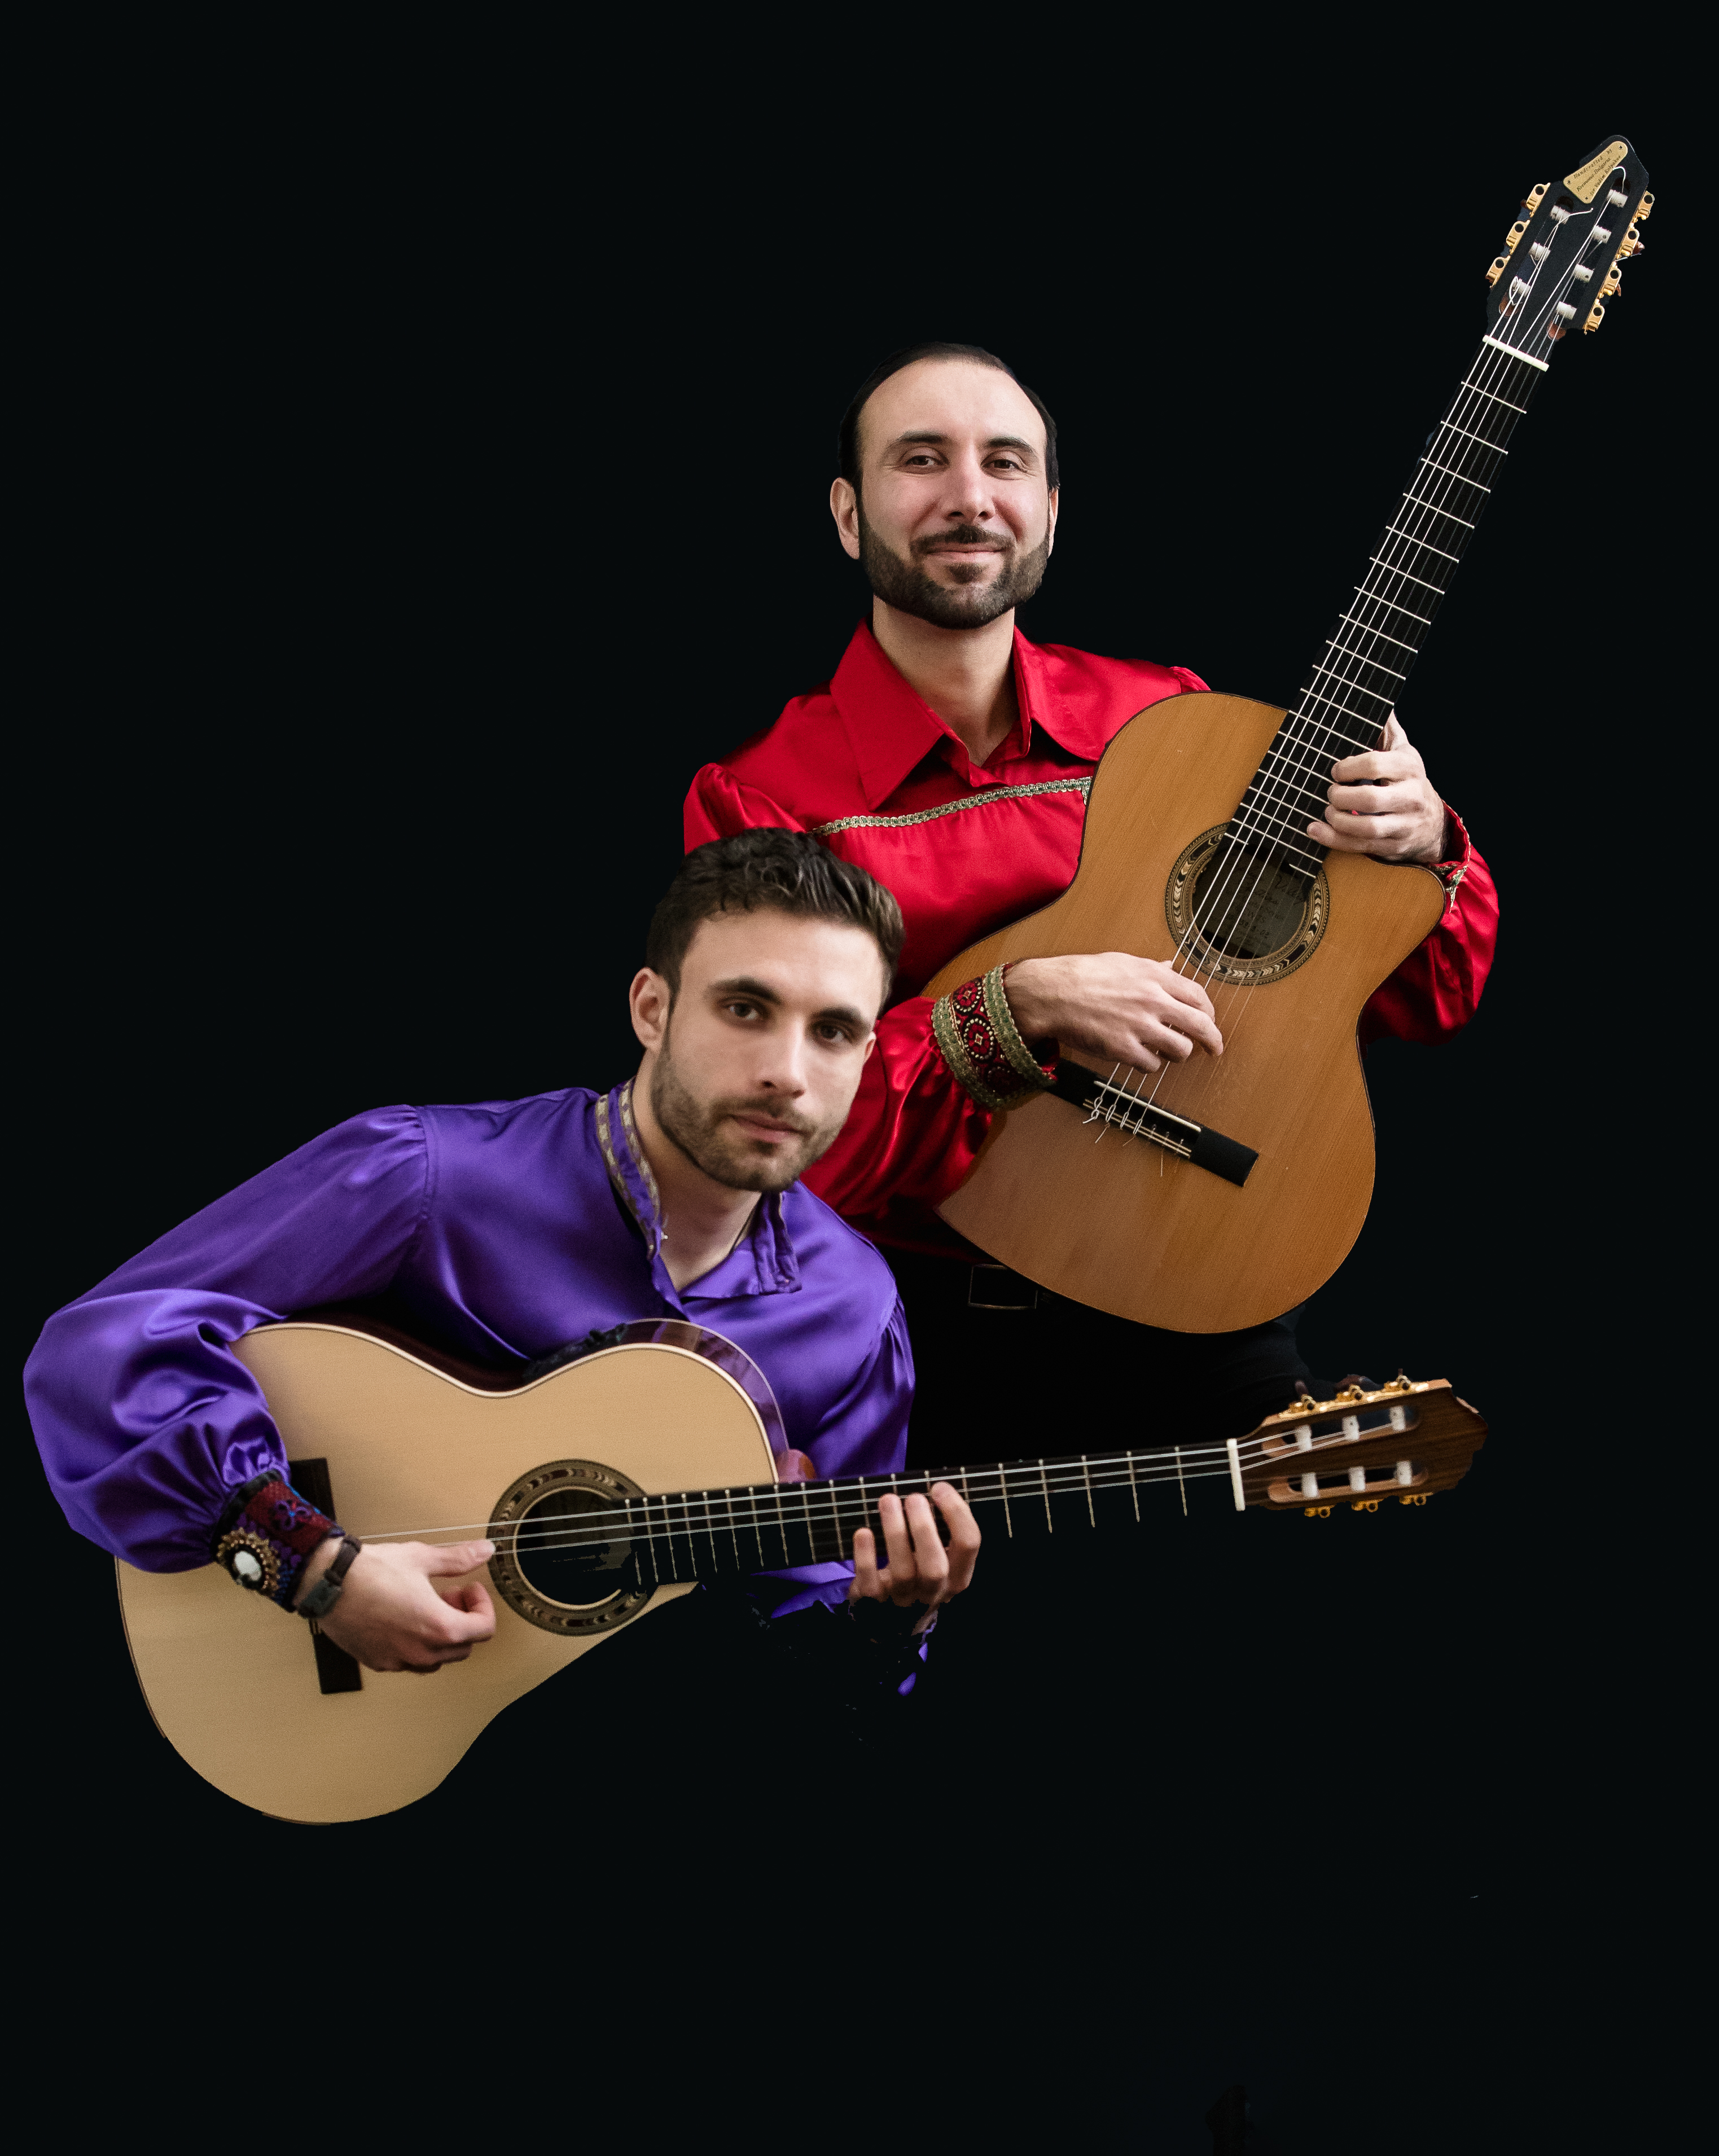 vs guitar duo acoustic gypsy guitar duo. Black Bedroom Furniture Sets. Home Design Ideas